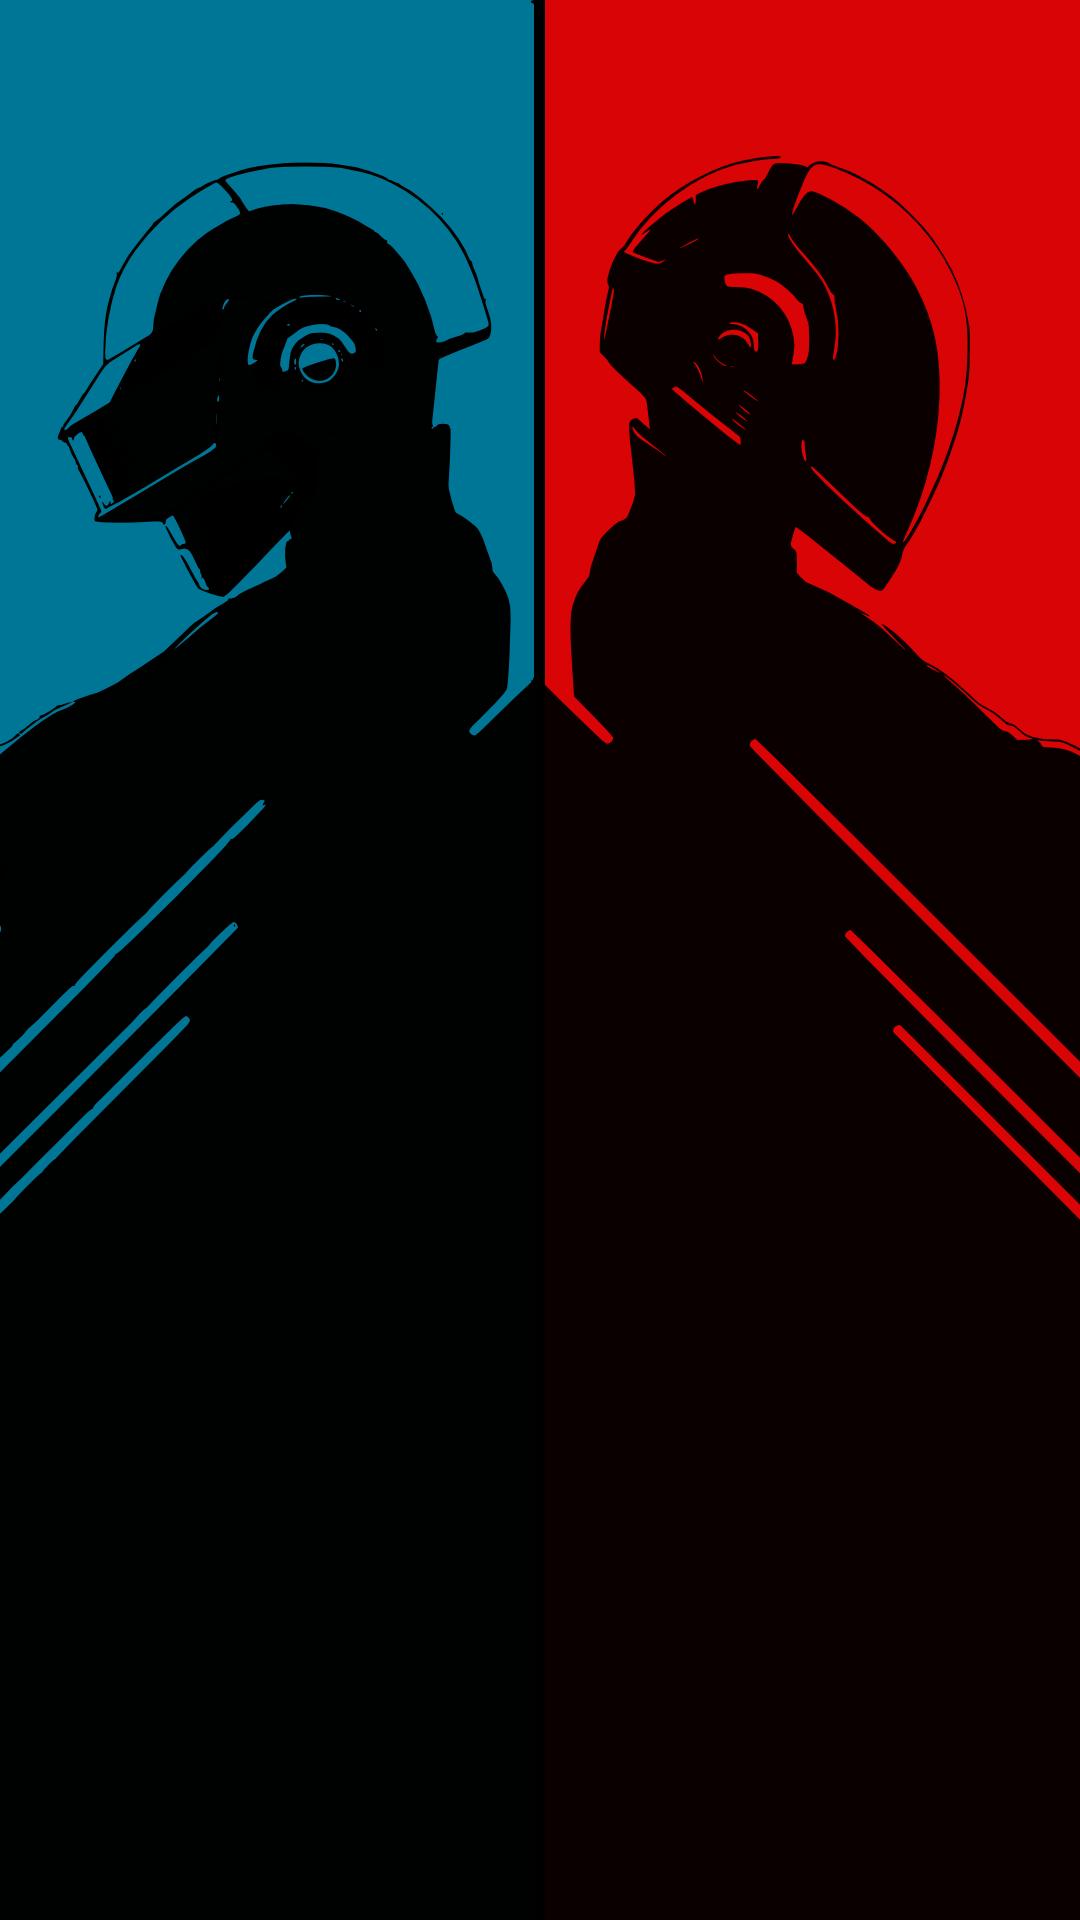 Daft Punk Cool Music IPhone Wallpaper